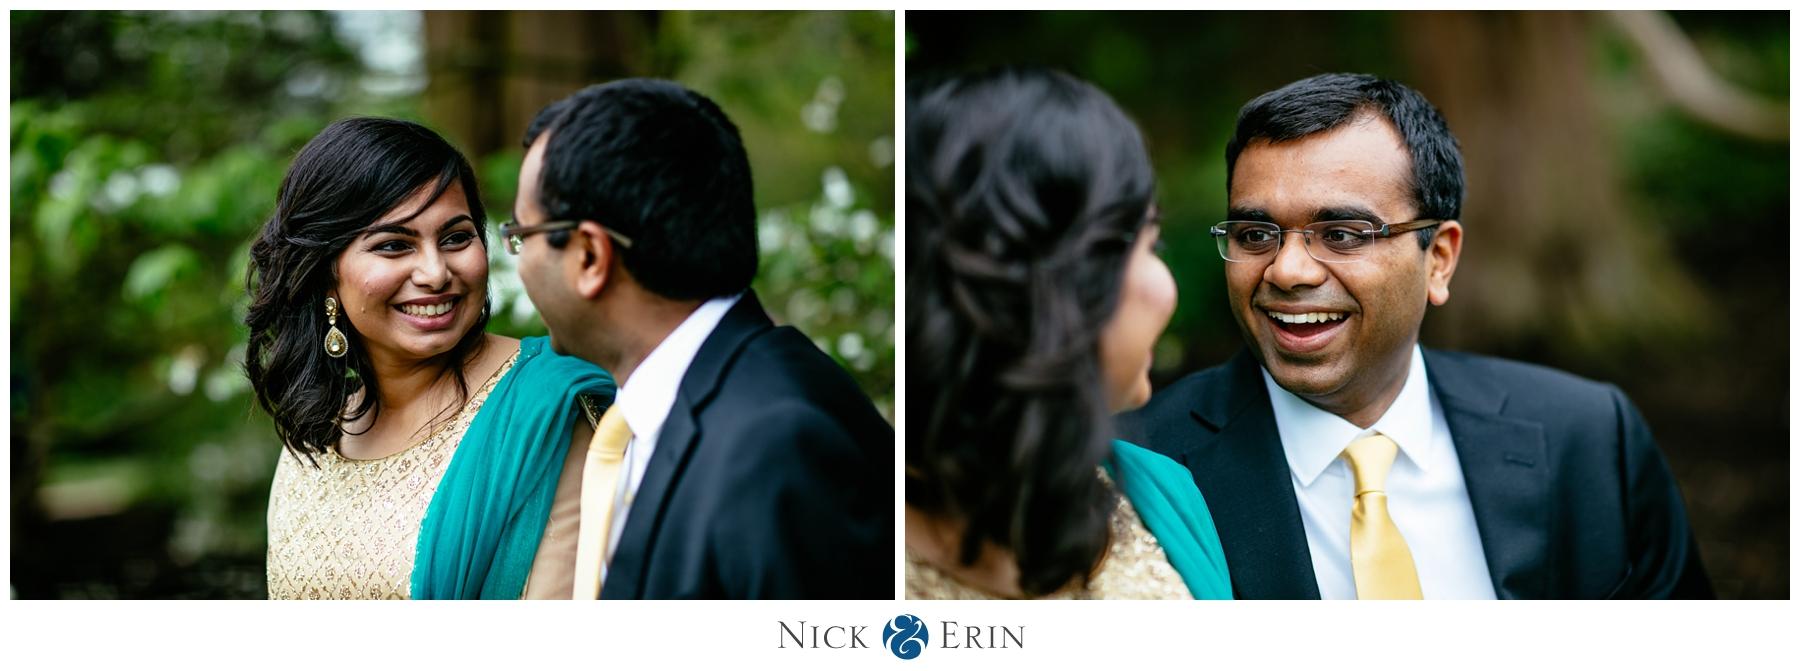 Donner_Photography_Arlington VA Wedding_Amrith and Aleefia_0006